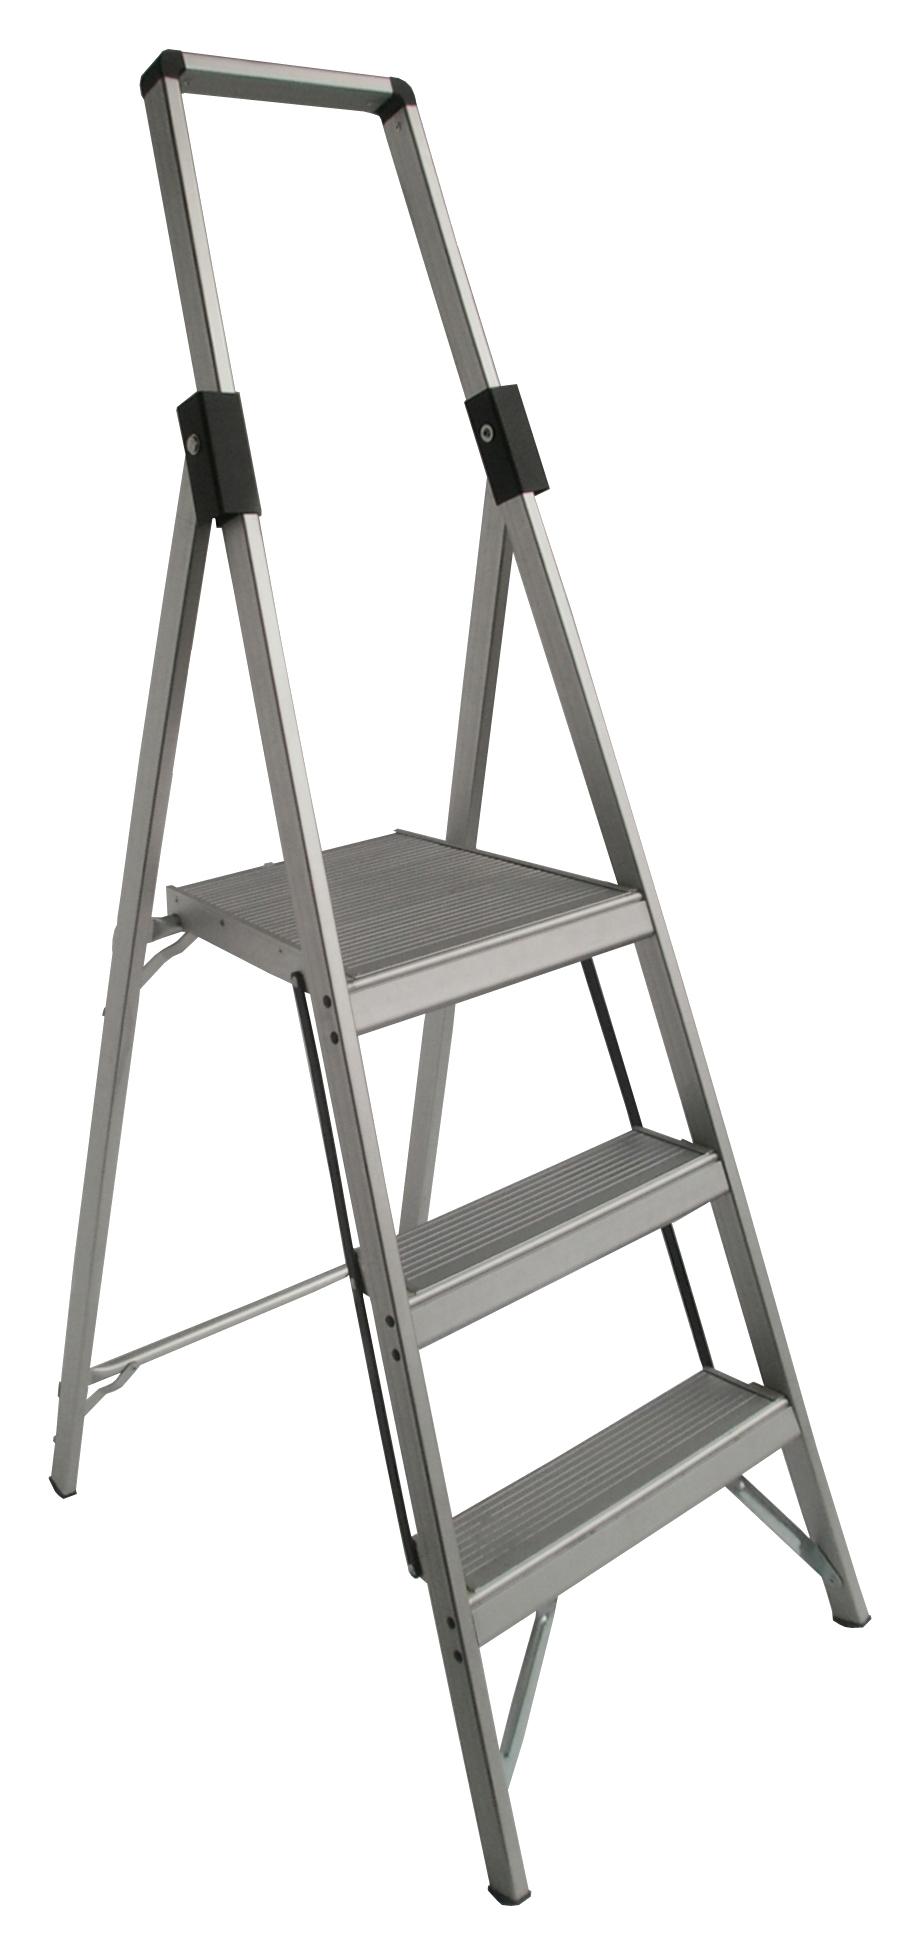 Indalex Tradesman Aluminium Slimline Platform Ladder 3